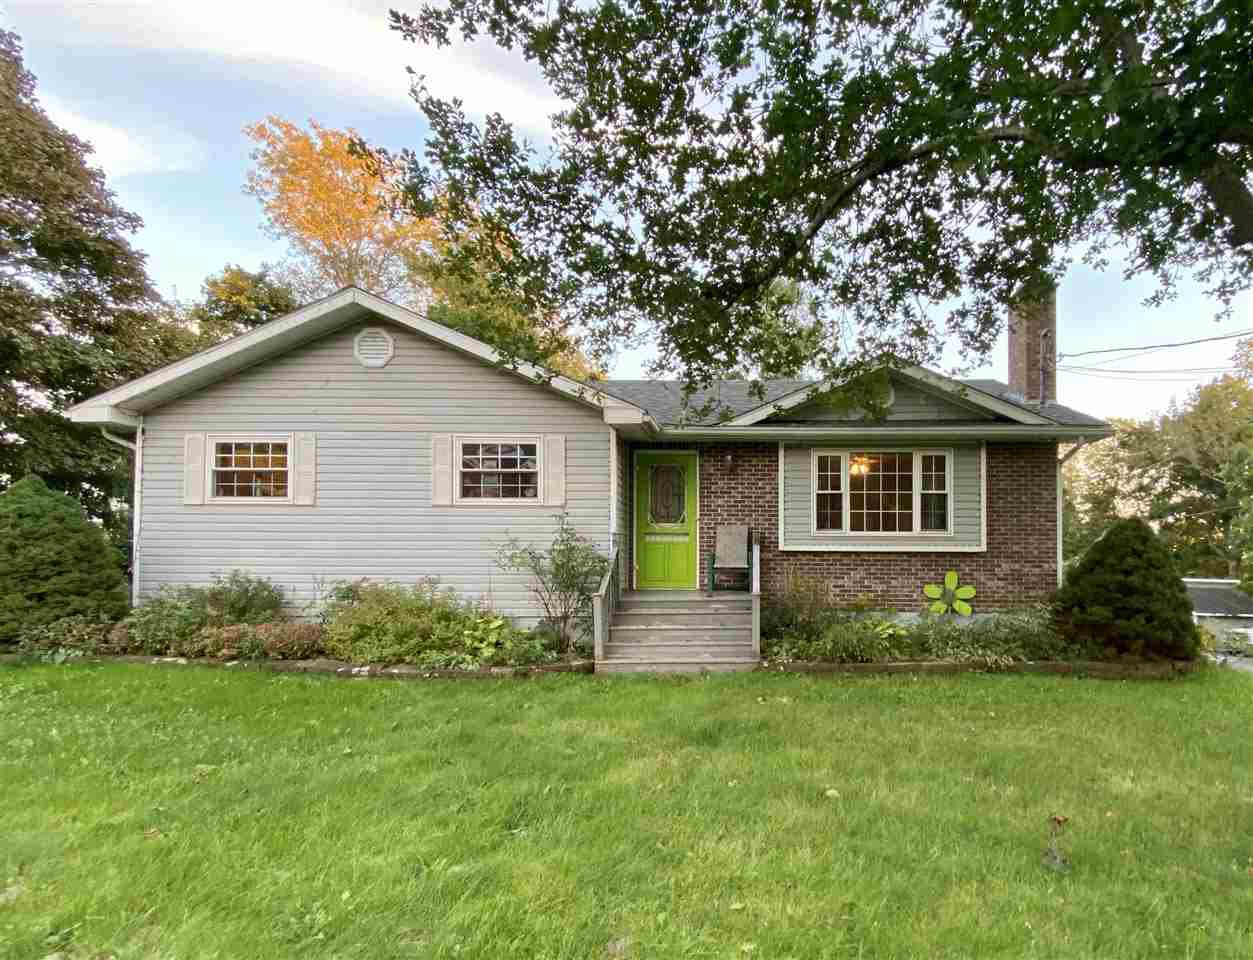 Main Photo: 21 Grange Street in Pictou: 107-Trenton,Westville,Pictou Residential for sale (Northern Region)  : MLS®# 202019941